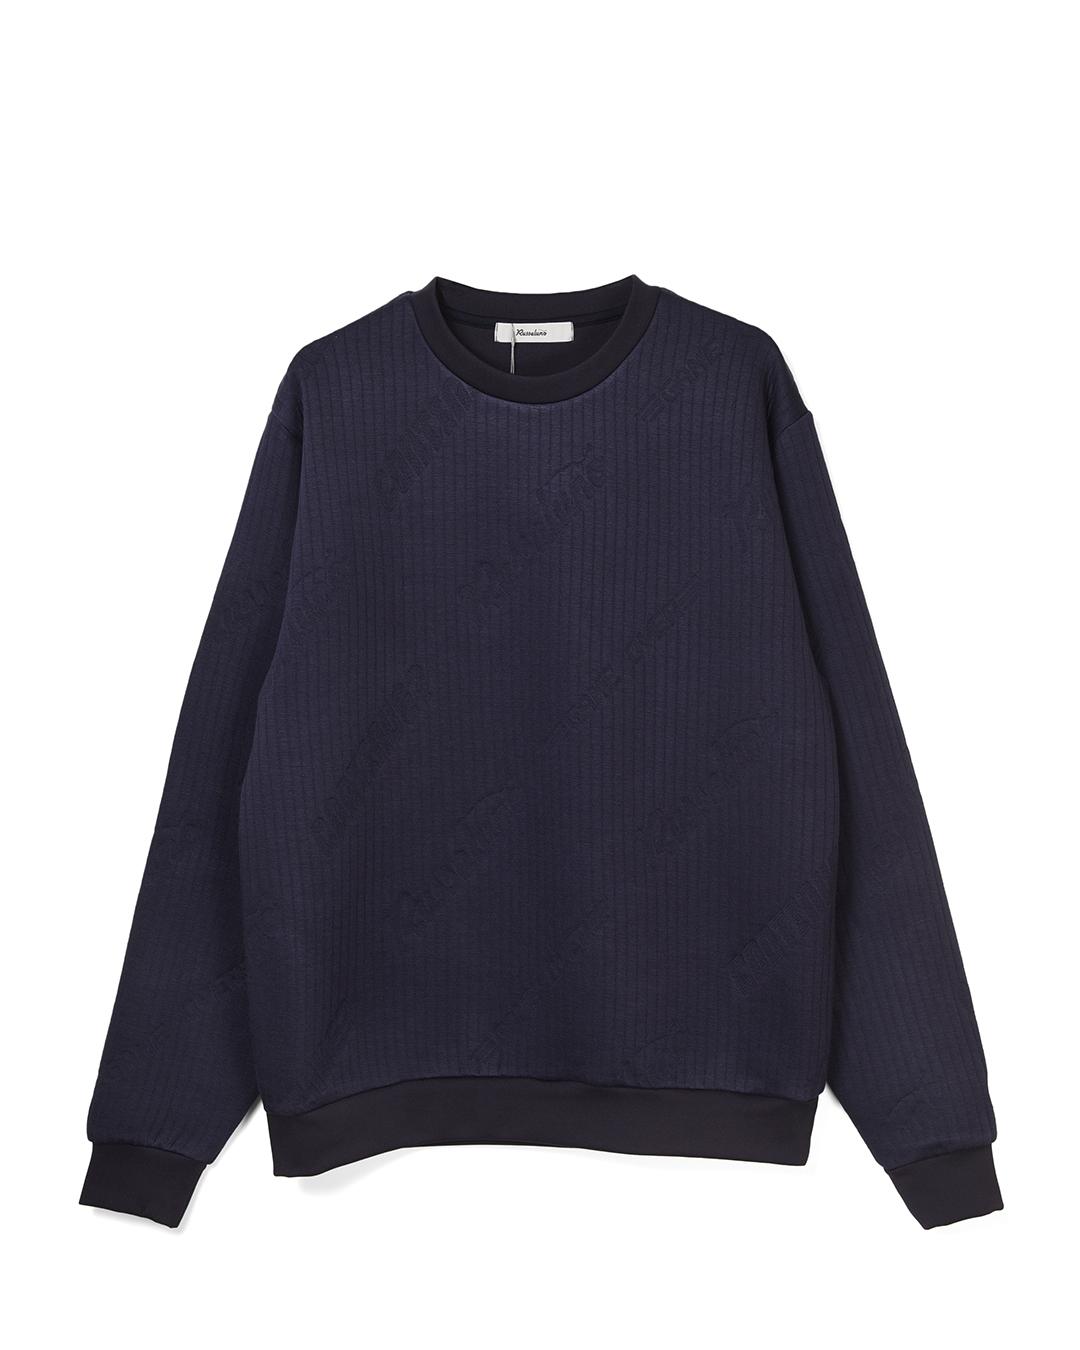 Style 006